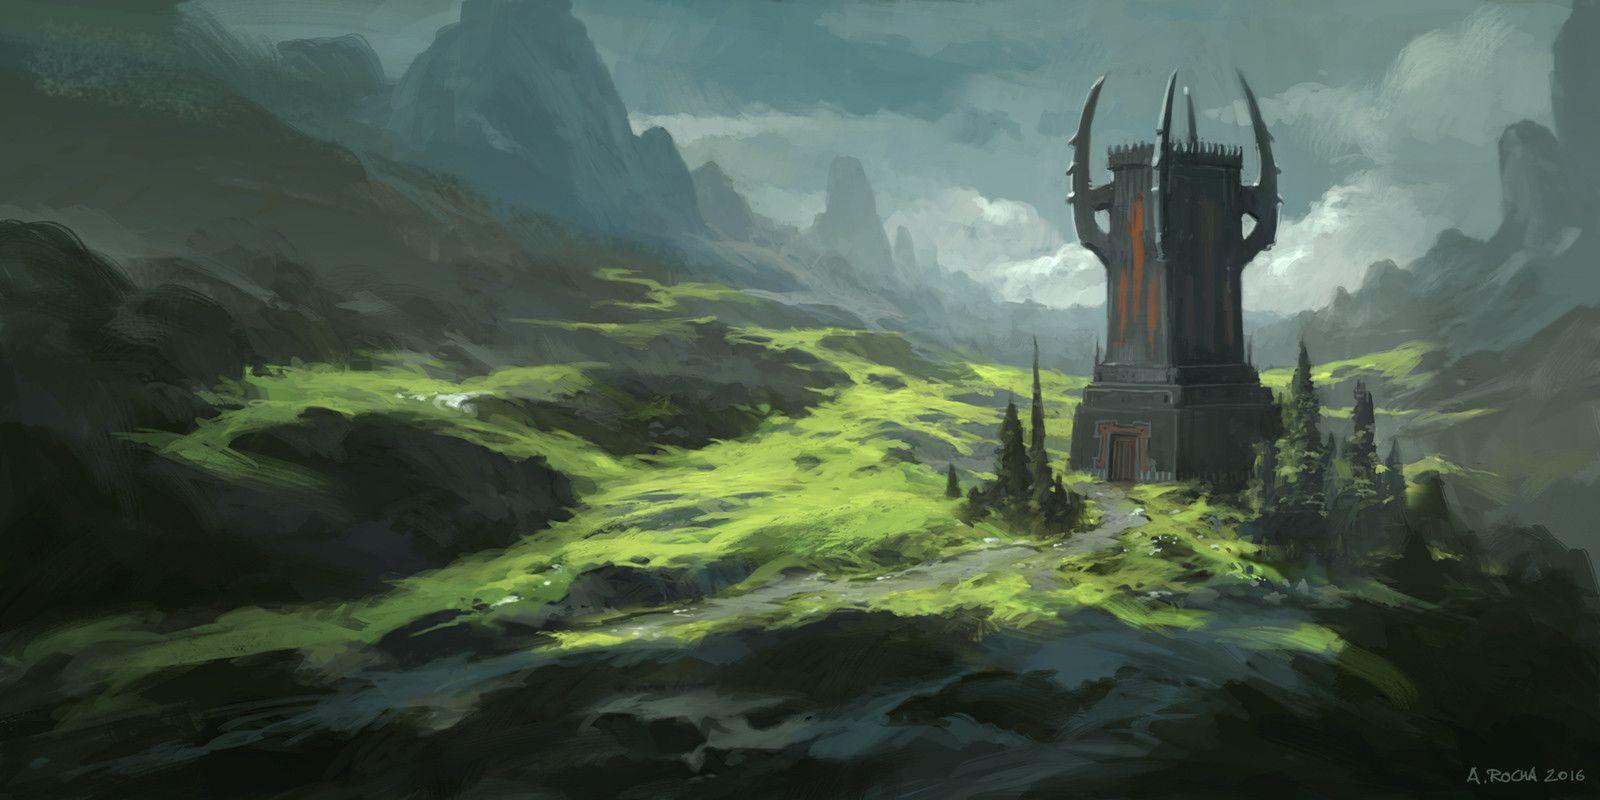 Orc Keep, Andreas Rocha on ArtStation at https://www.artstation.com/artwork/OOwL6?utm_campaign=digest&utm_medium=email&utm_source=email_digest_mailer